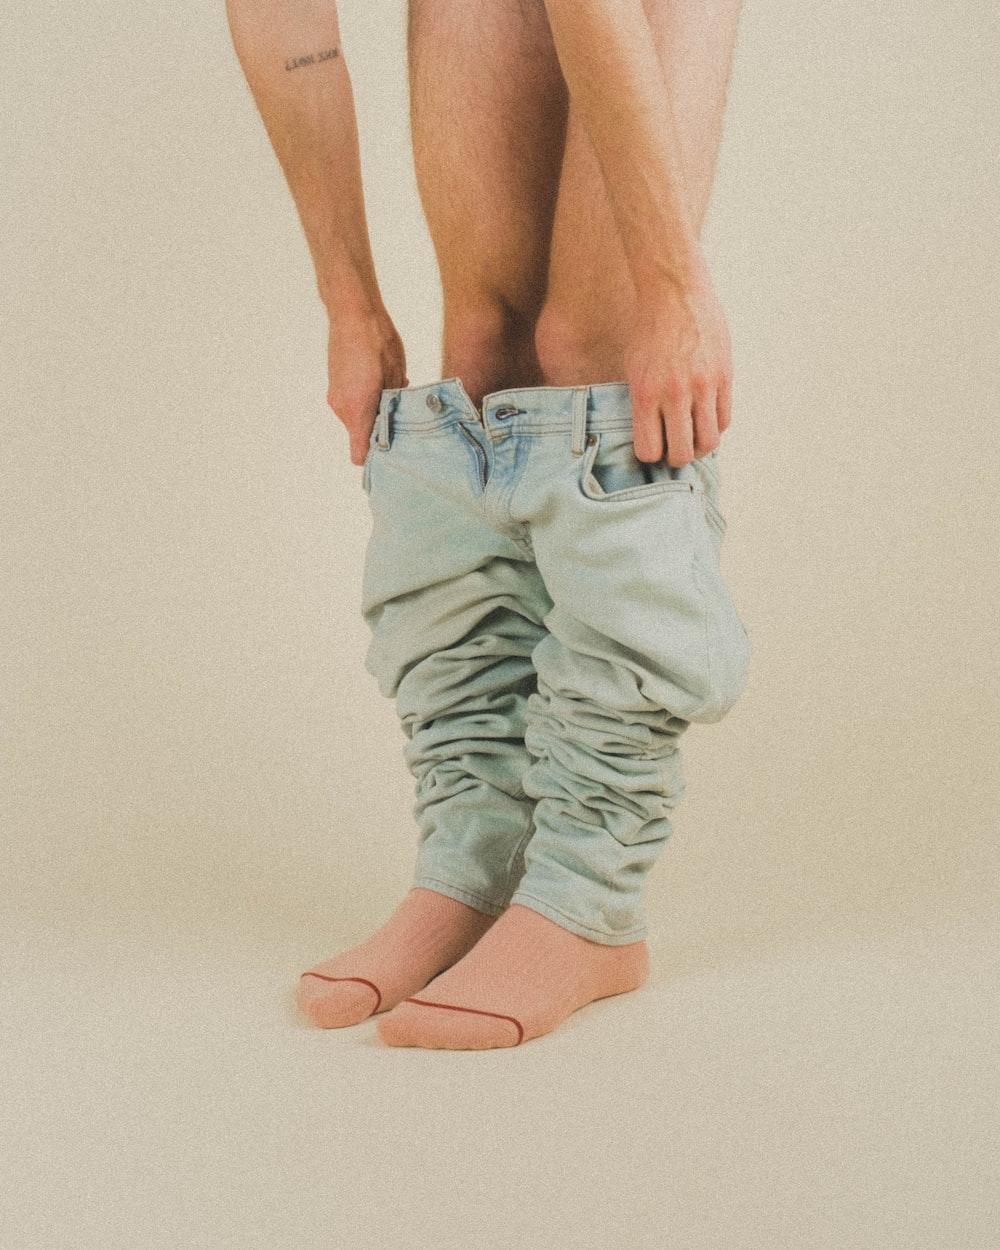 person in gray denim jeans